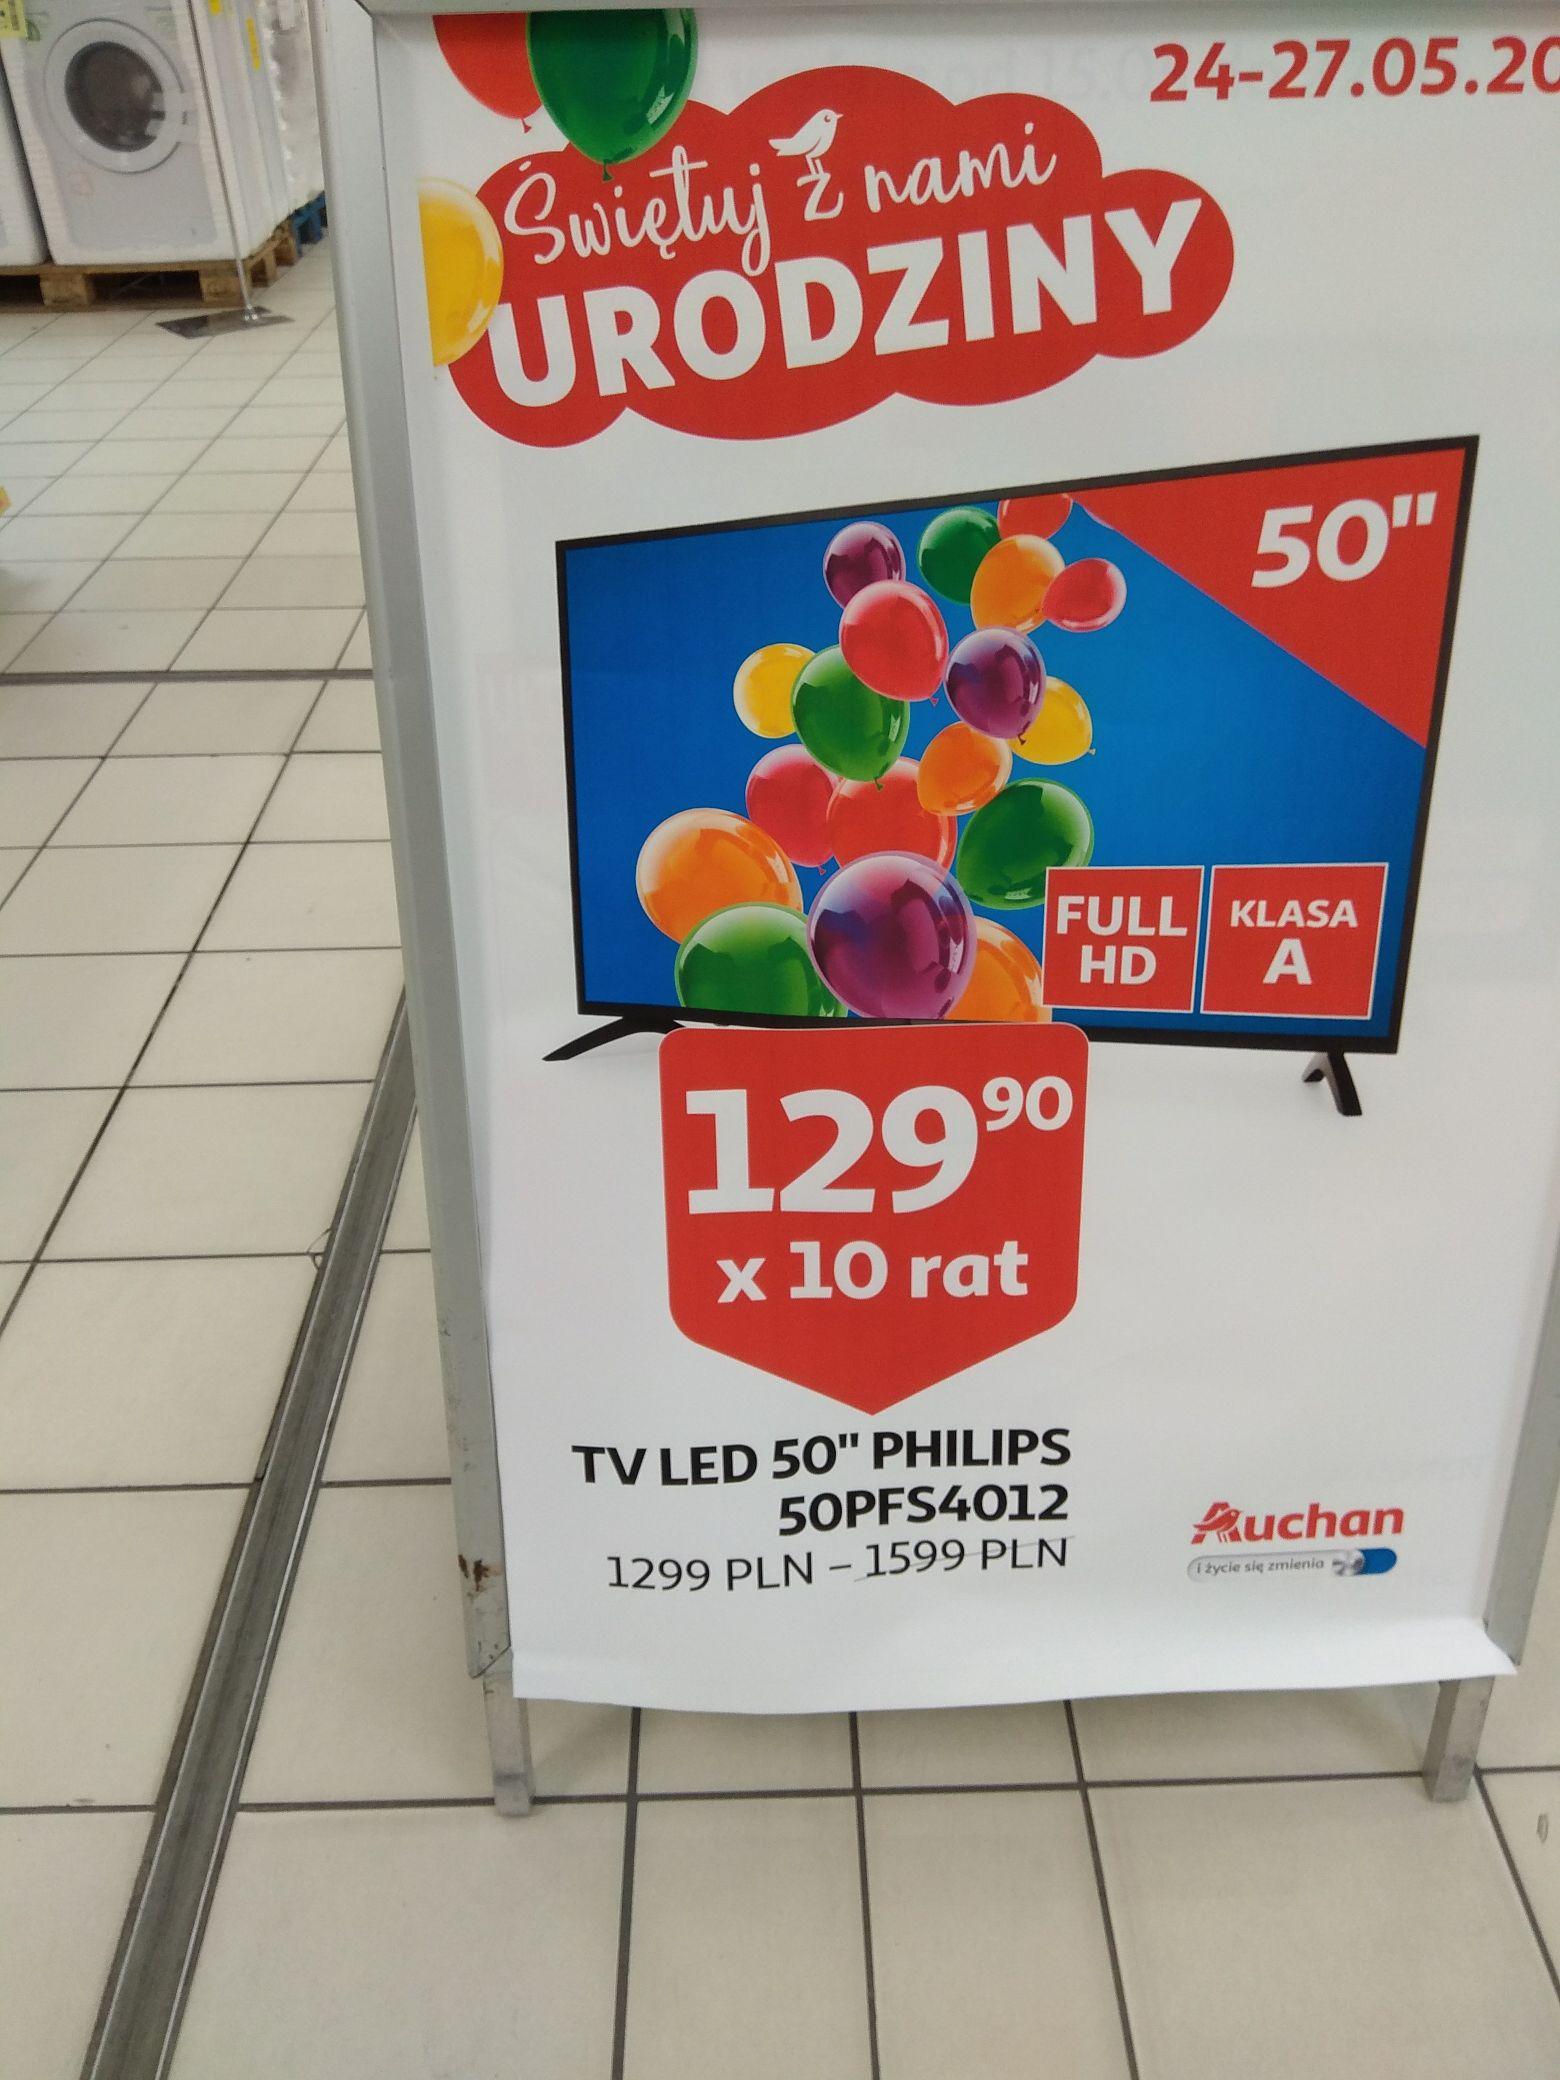 Telewizor Philips 50 Cali Auchan